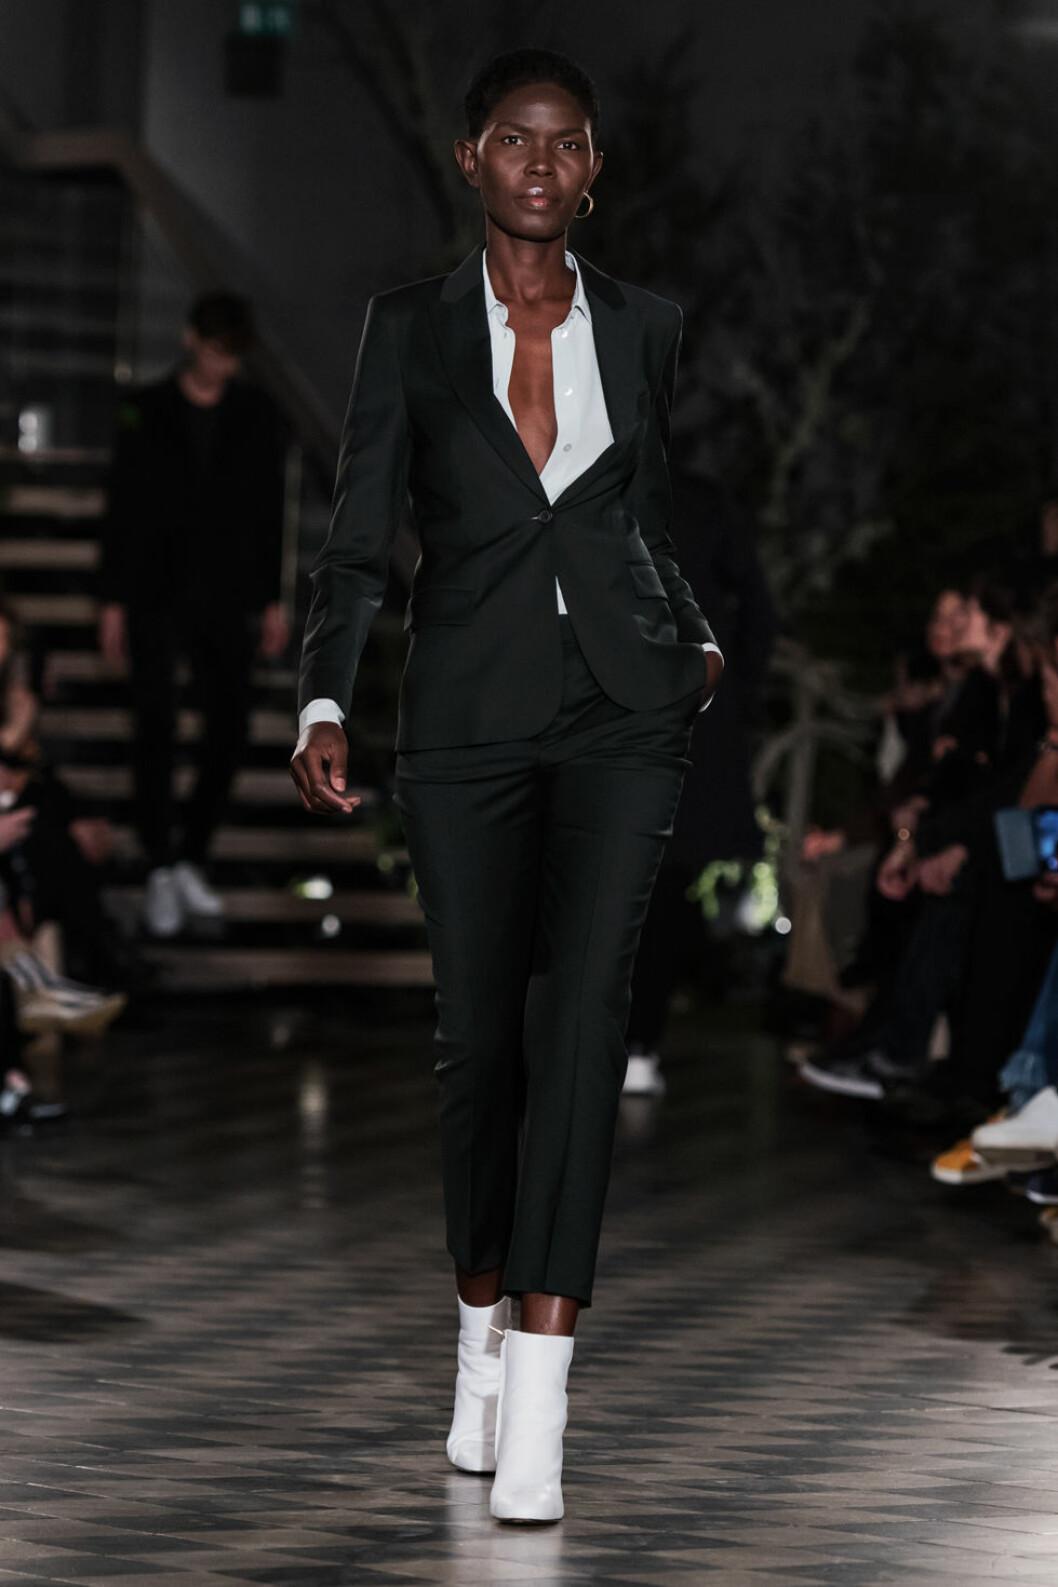 Filippa K AW 18, kvinna i vit skjorta och svart kostym.